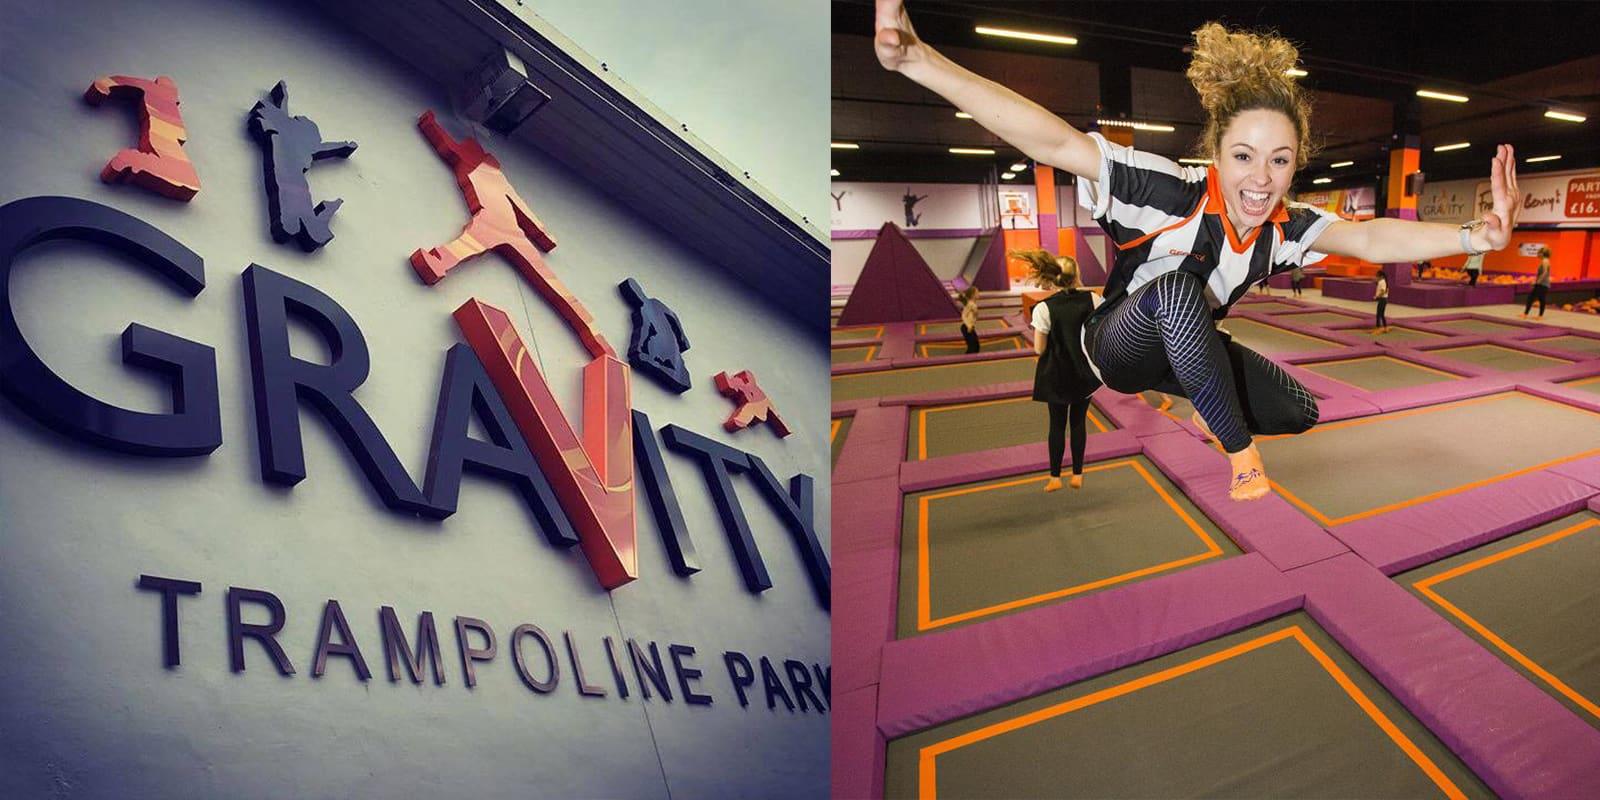 GraVity Trampoline Park has opened in Edinburgh!